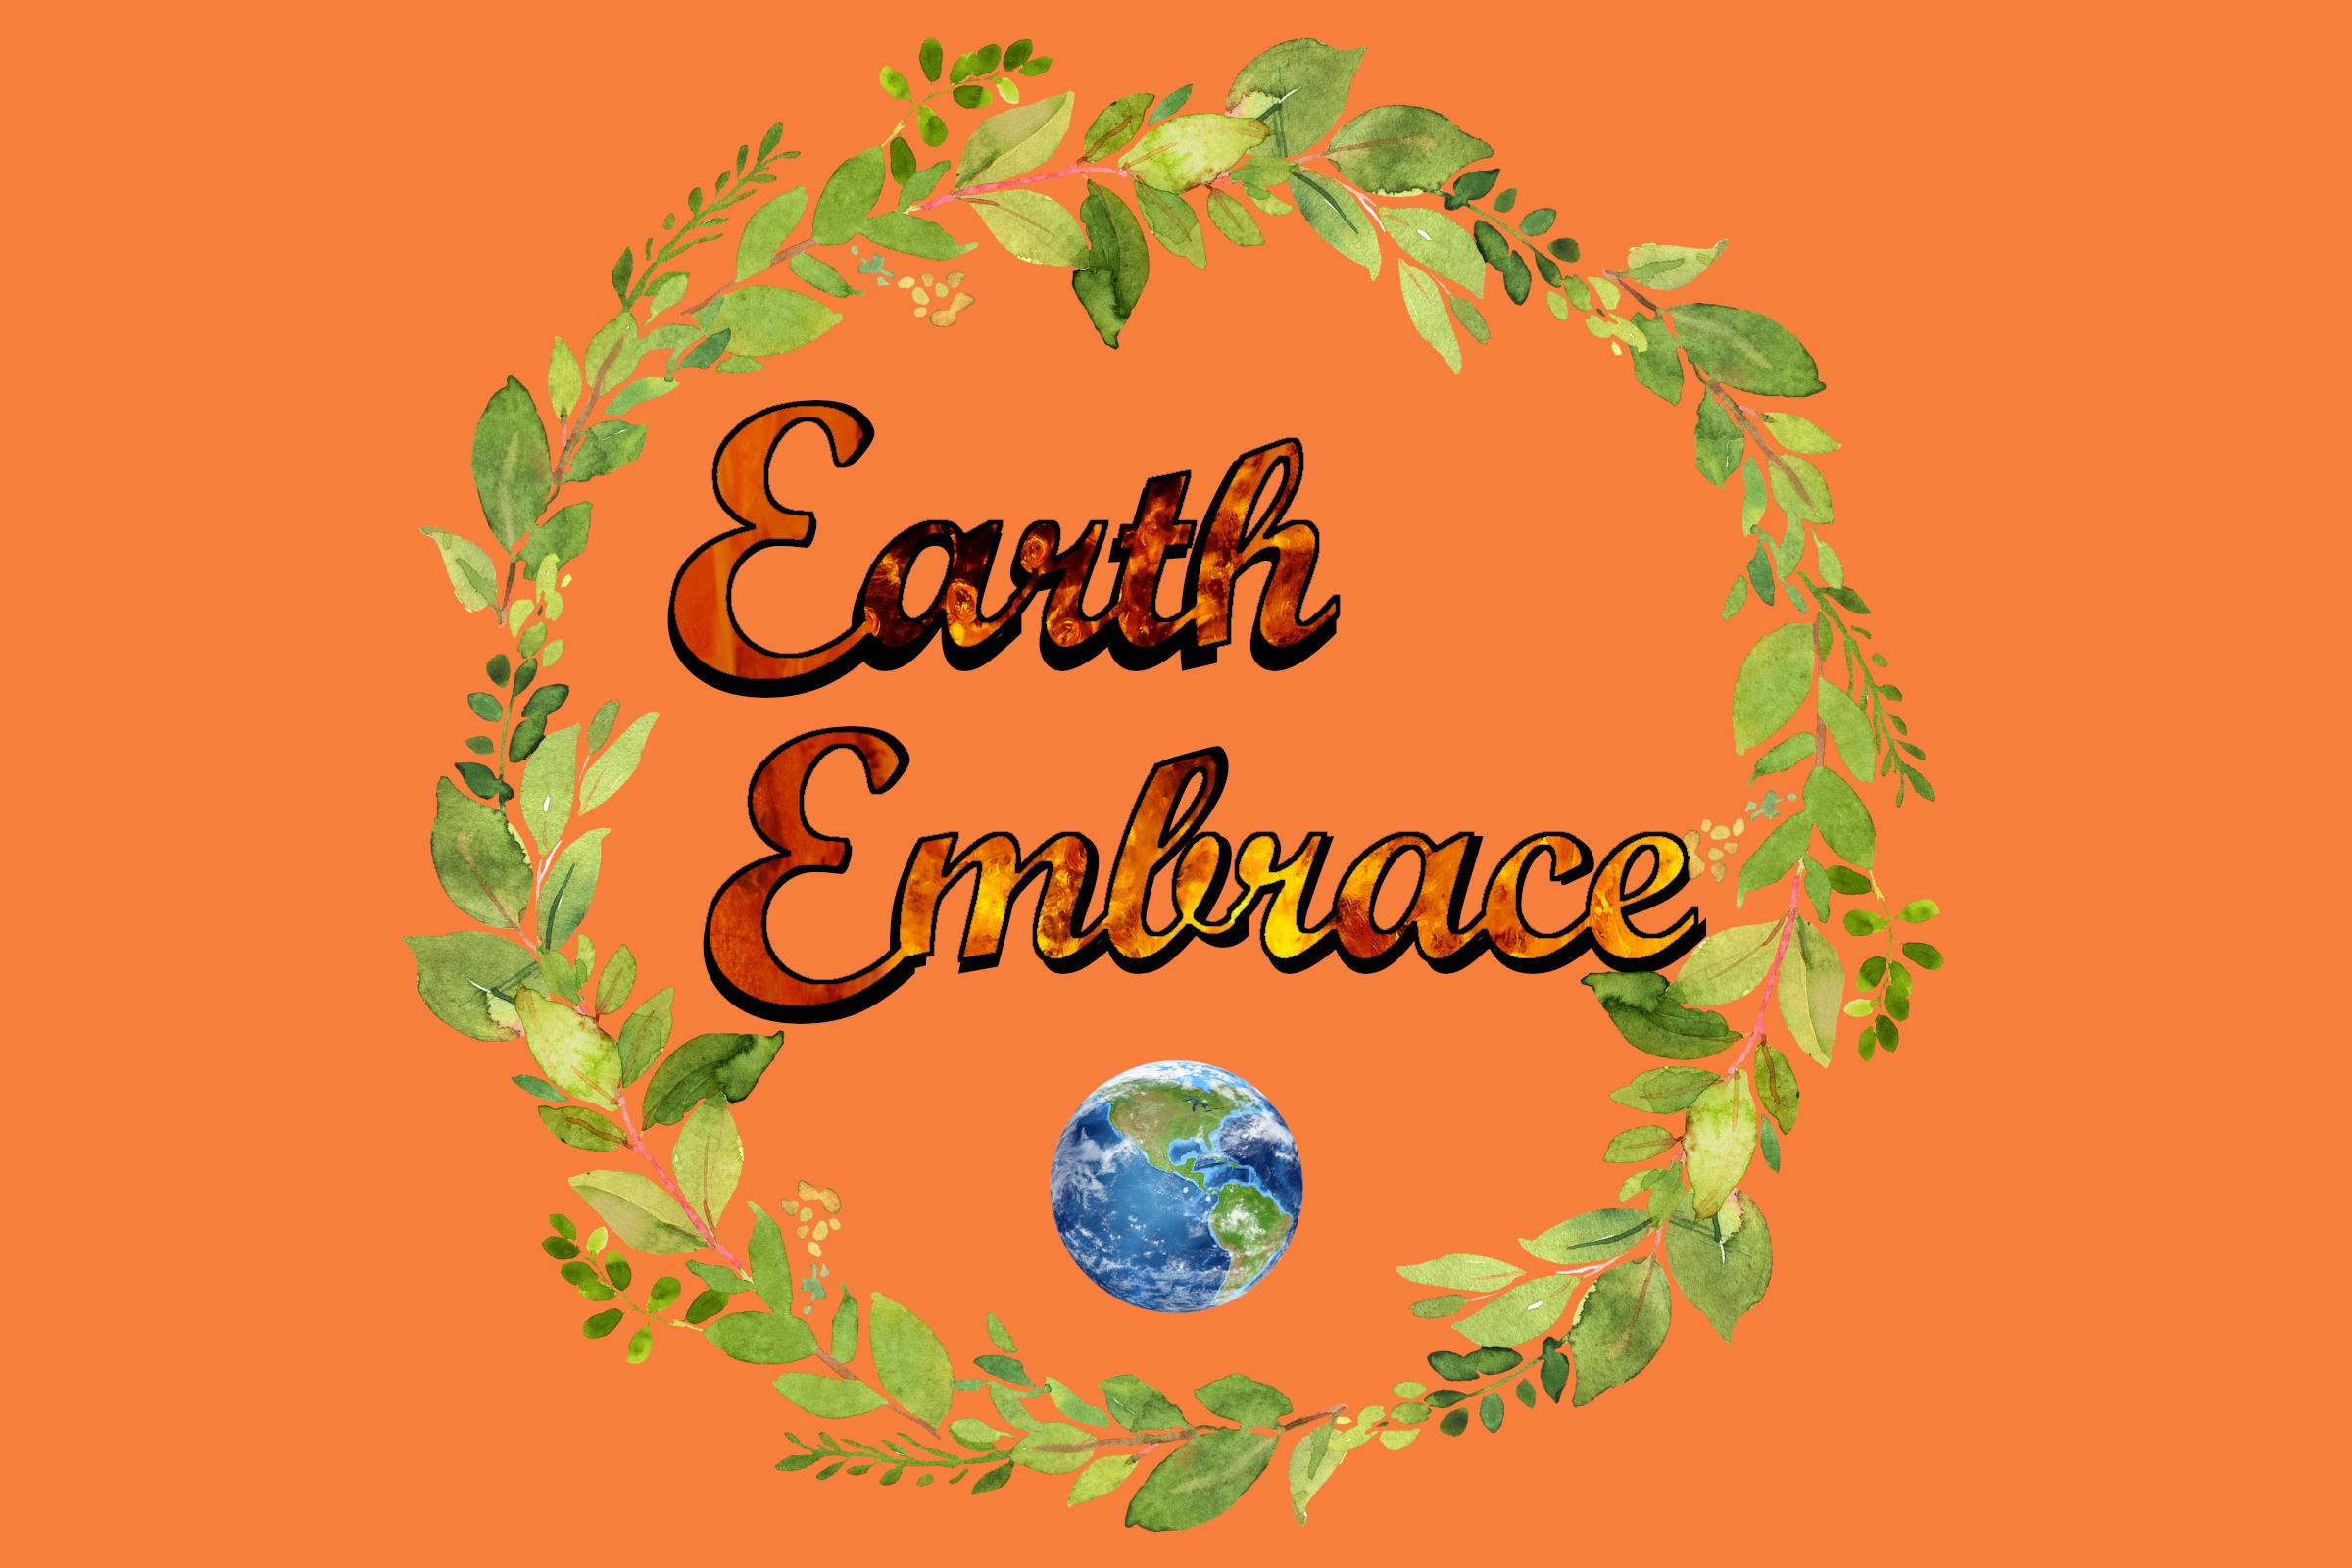 Earth Embrace Homecoming (Organization)